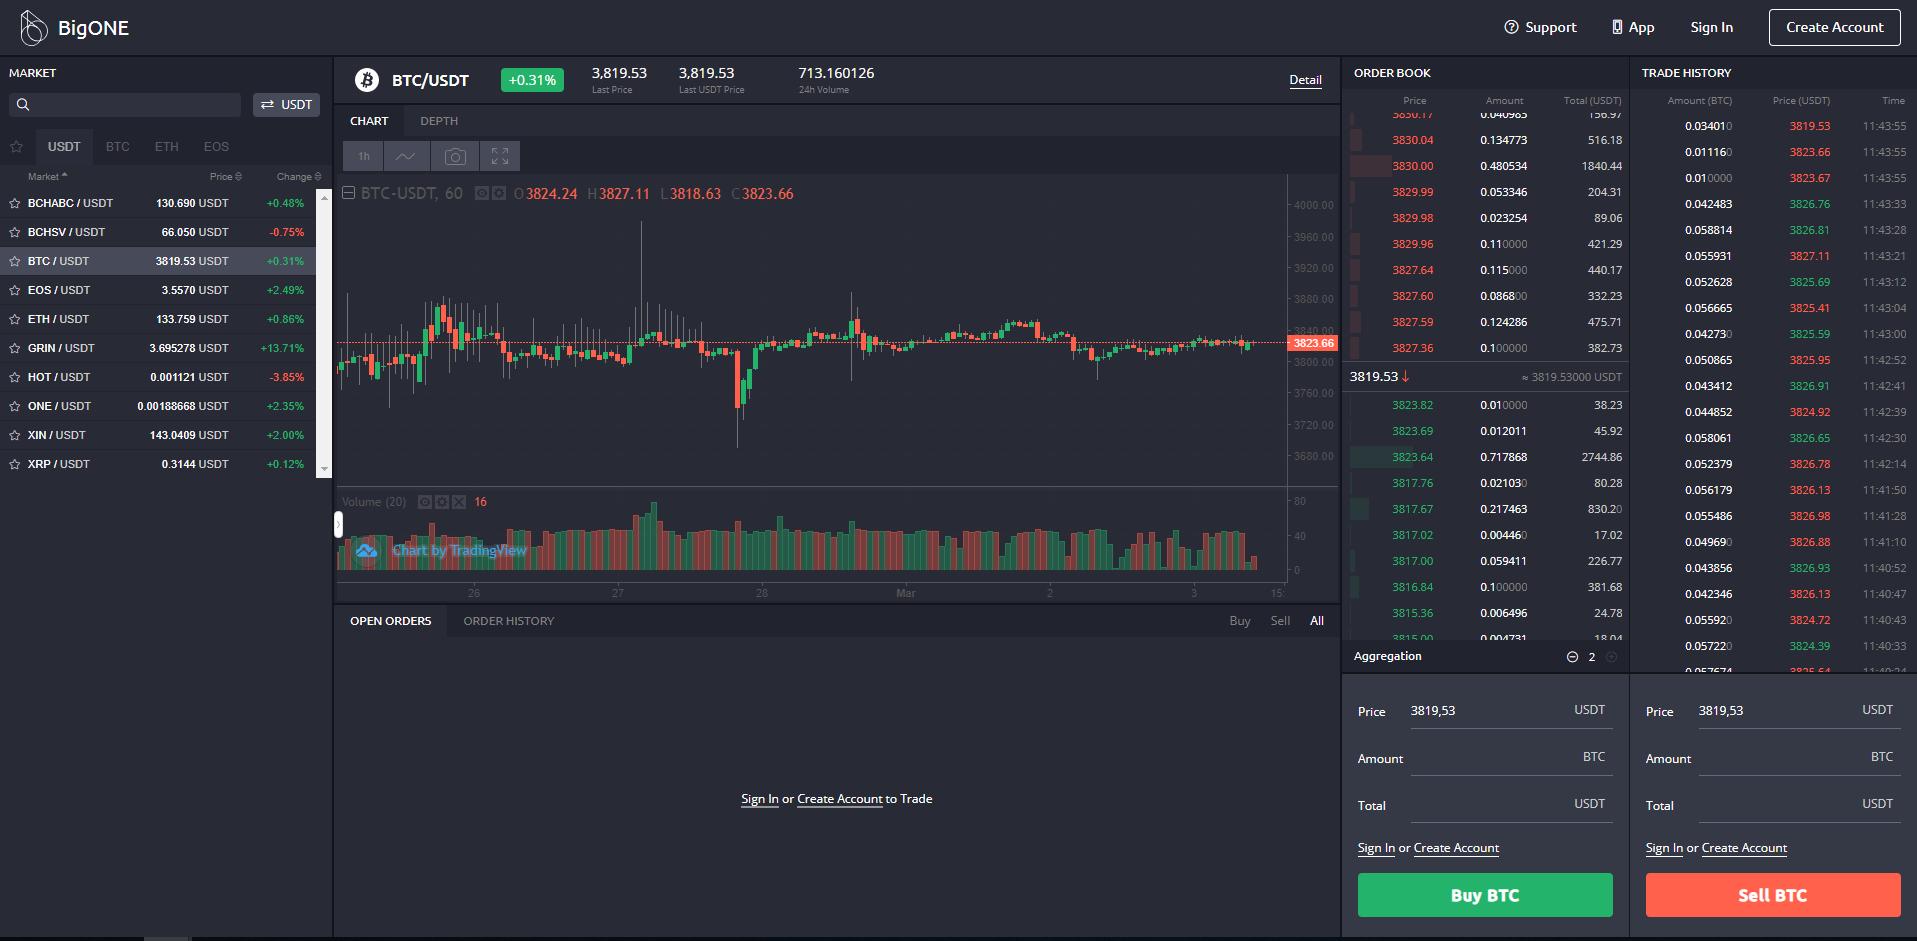 BigONE Trading View